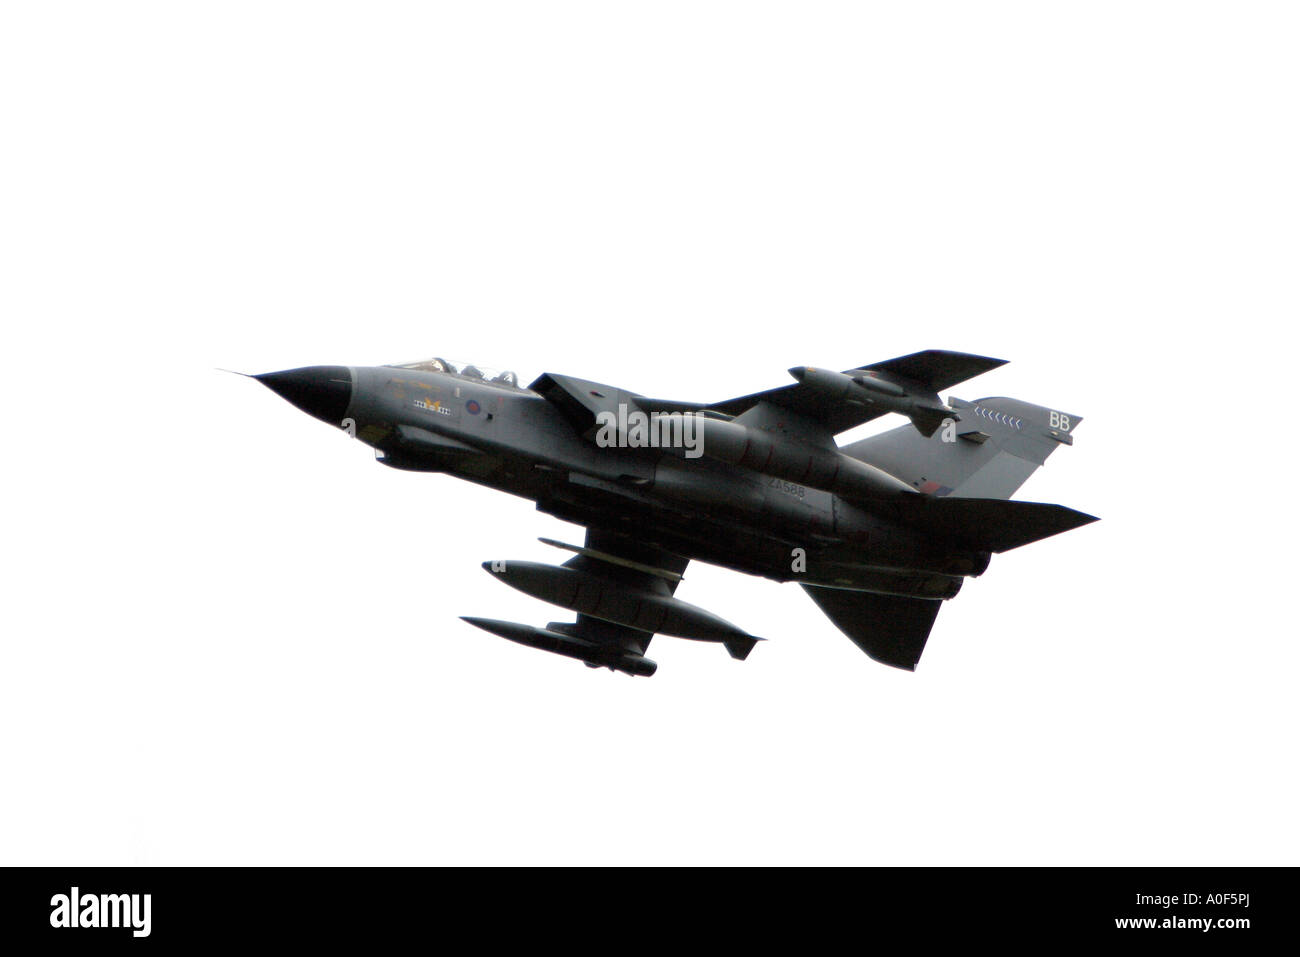 Tornado Fighter Aircraft - Stock Image